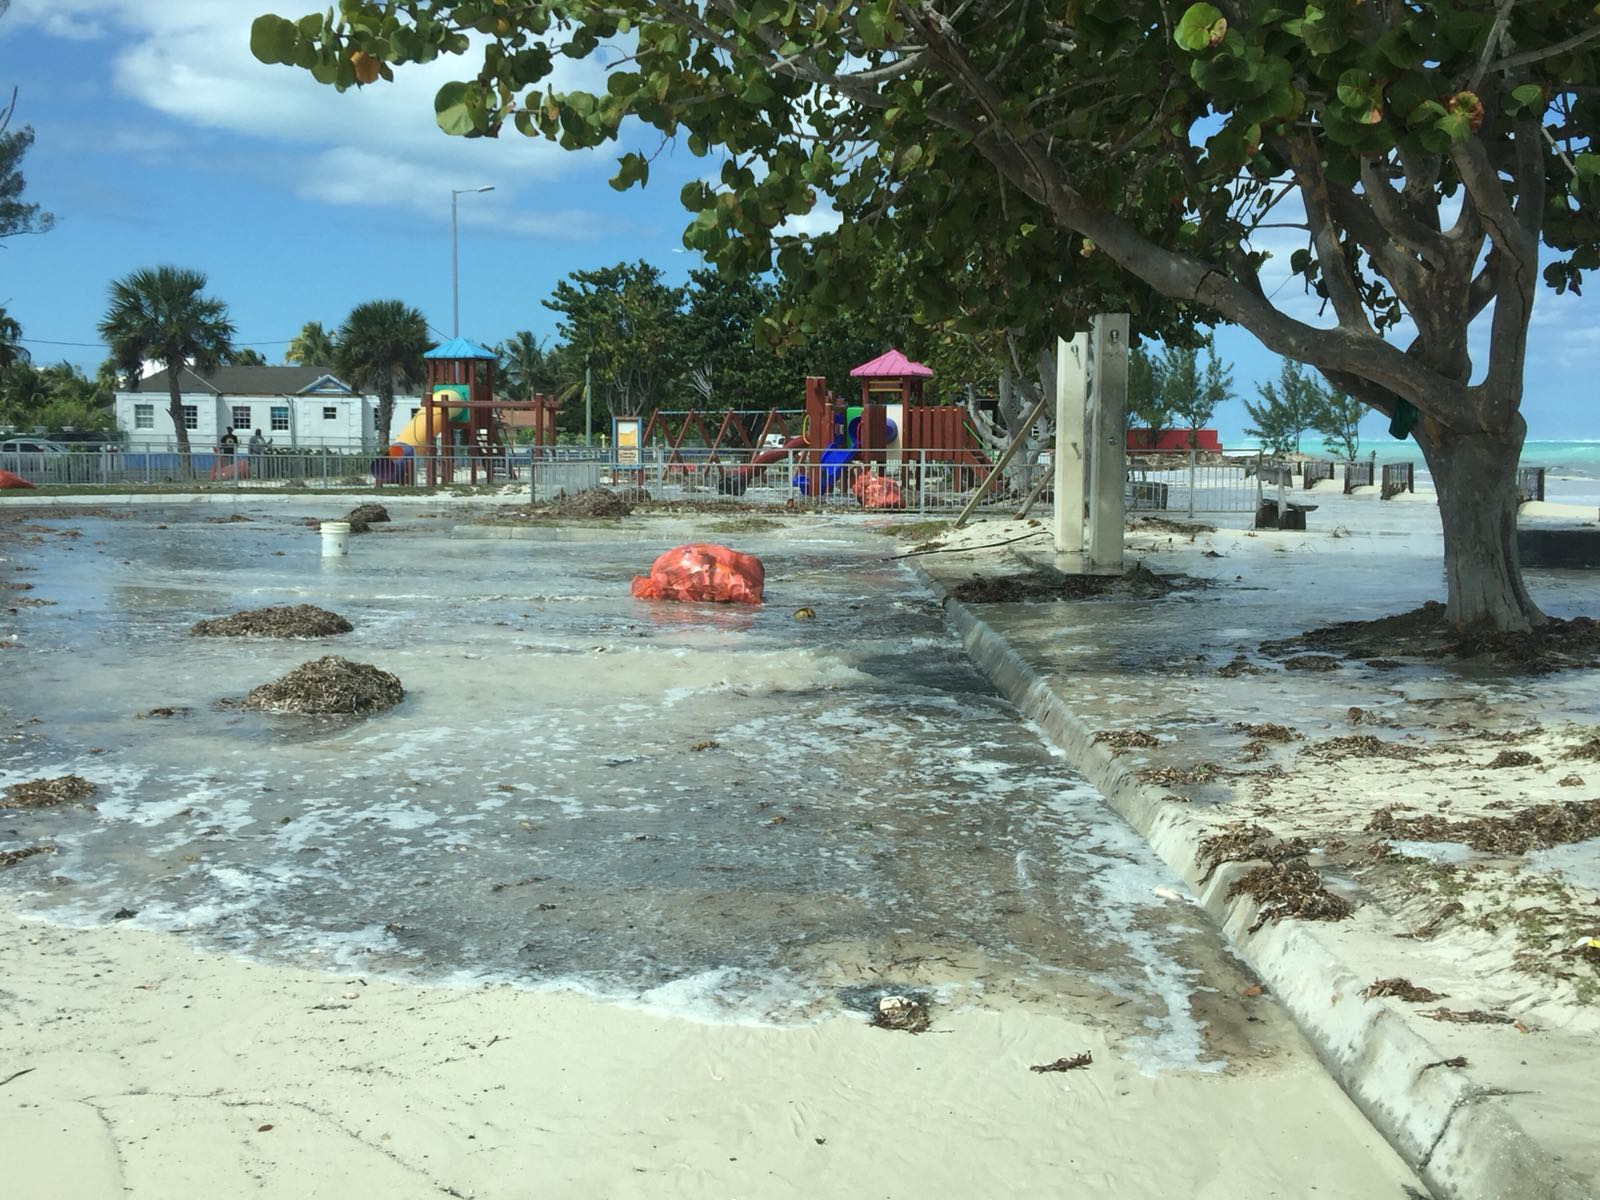 Severe weather impacts coastal roads